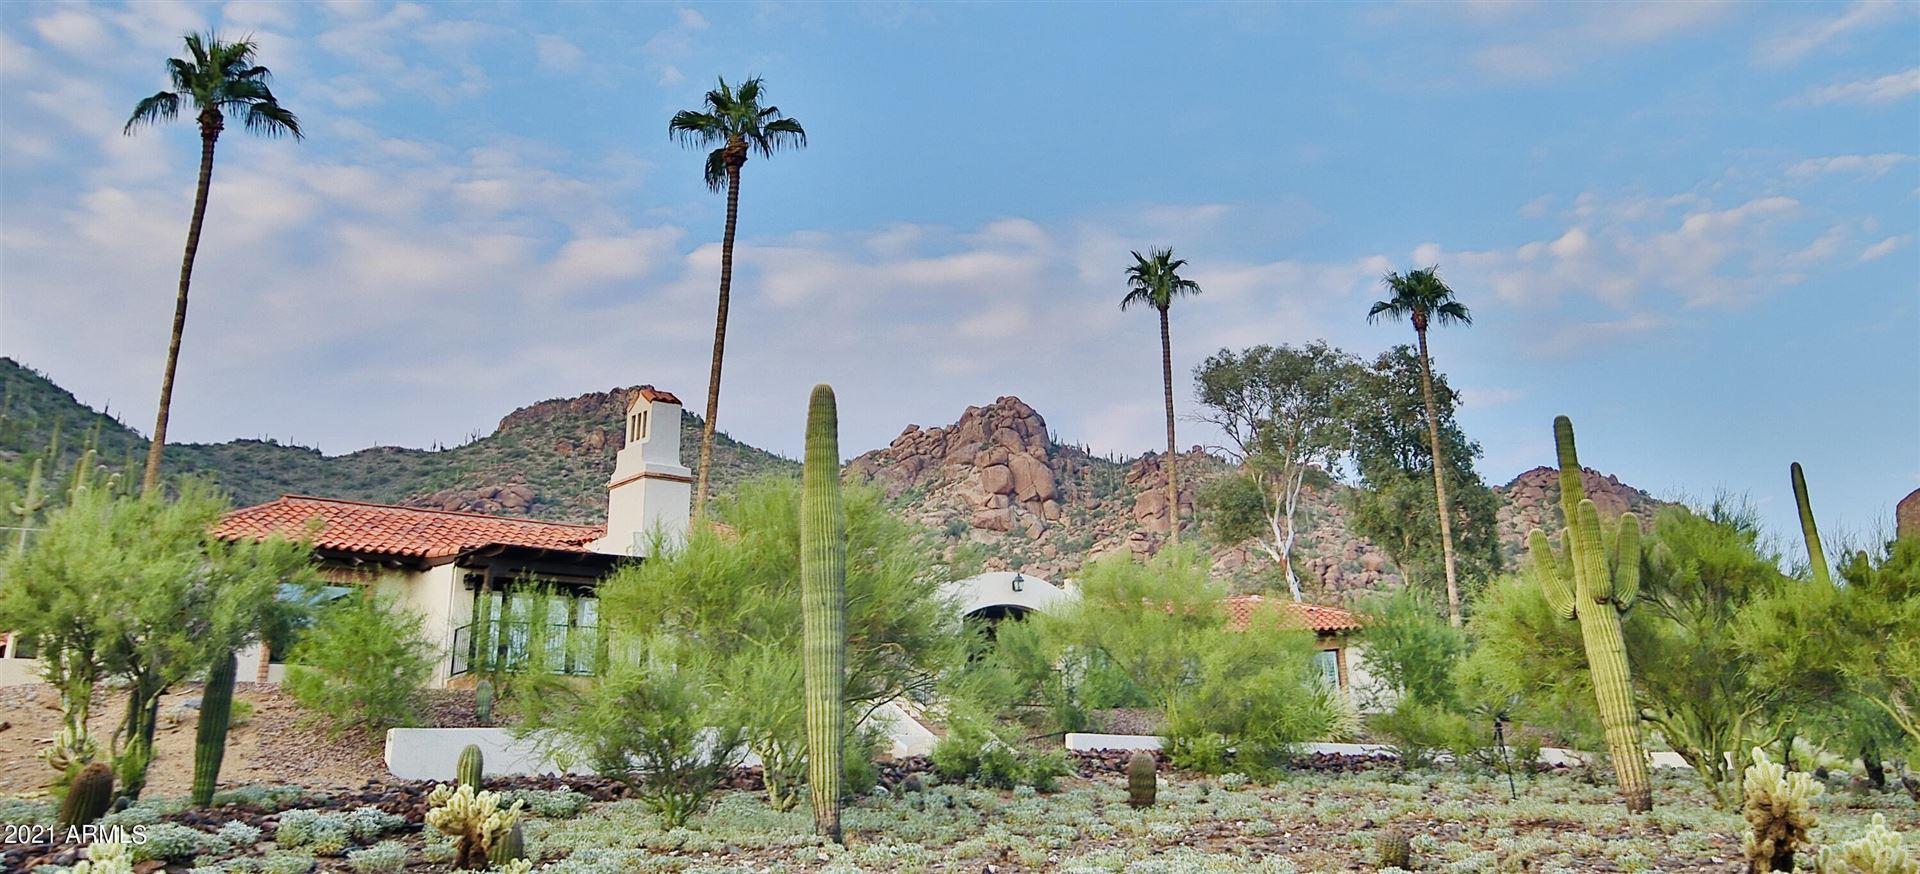 Photo of 6508 E EL SENDERO Road, Carefree, AZ 85377 (MLS # 6295580)